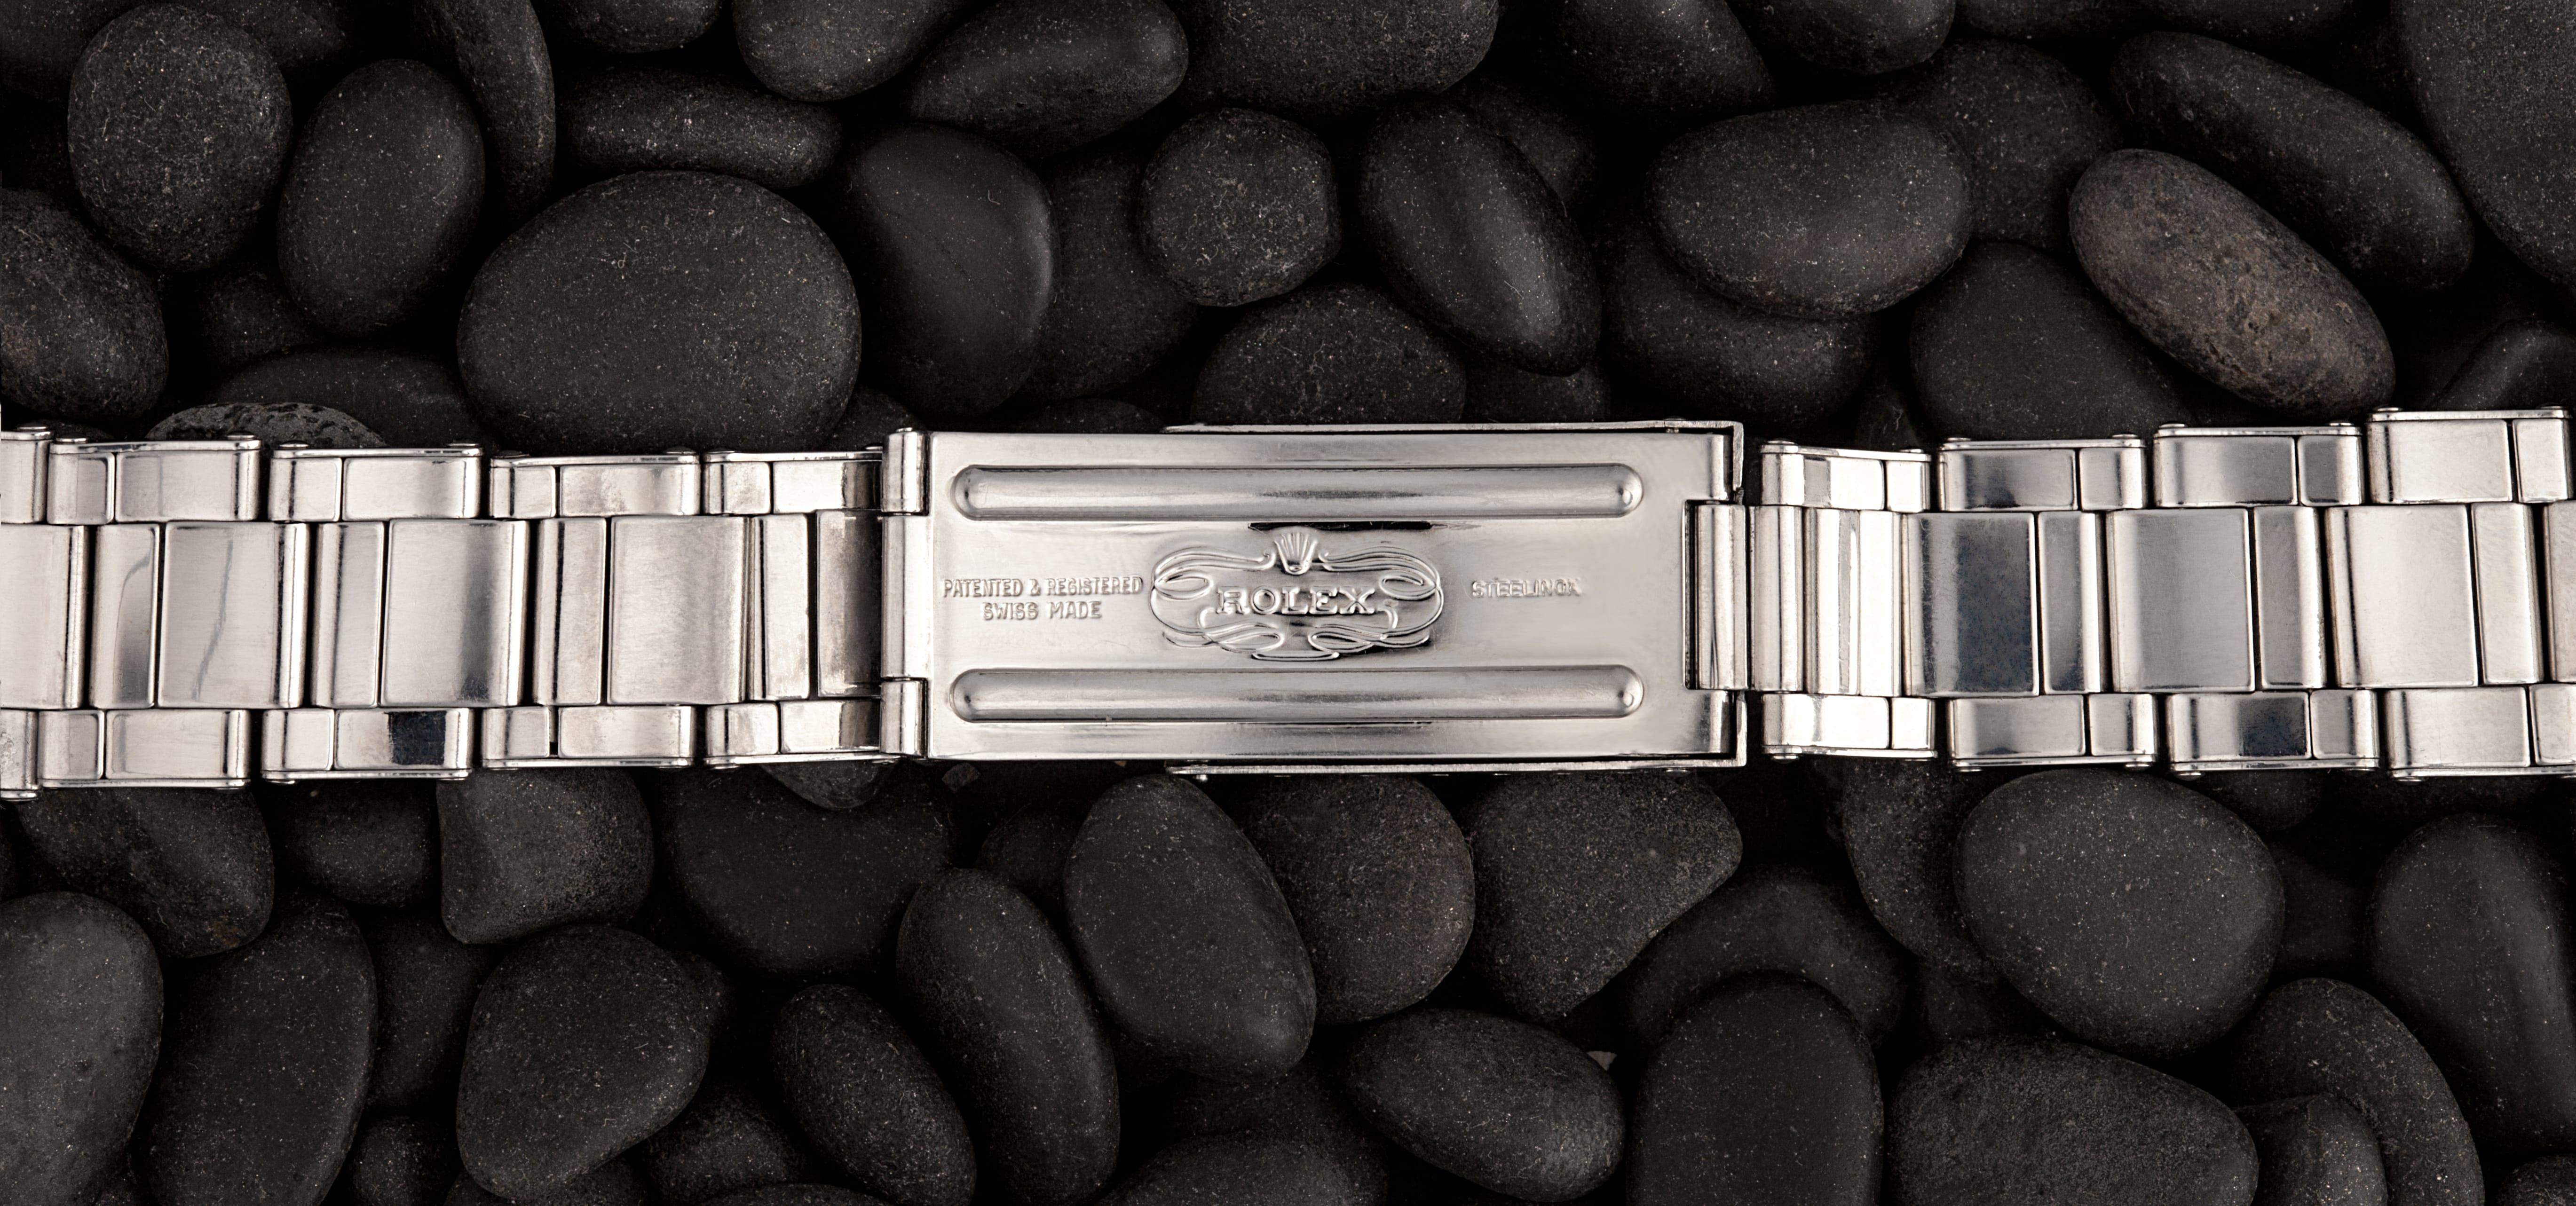 Rolex Oyster Bracelet Rivet Clasp Markings